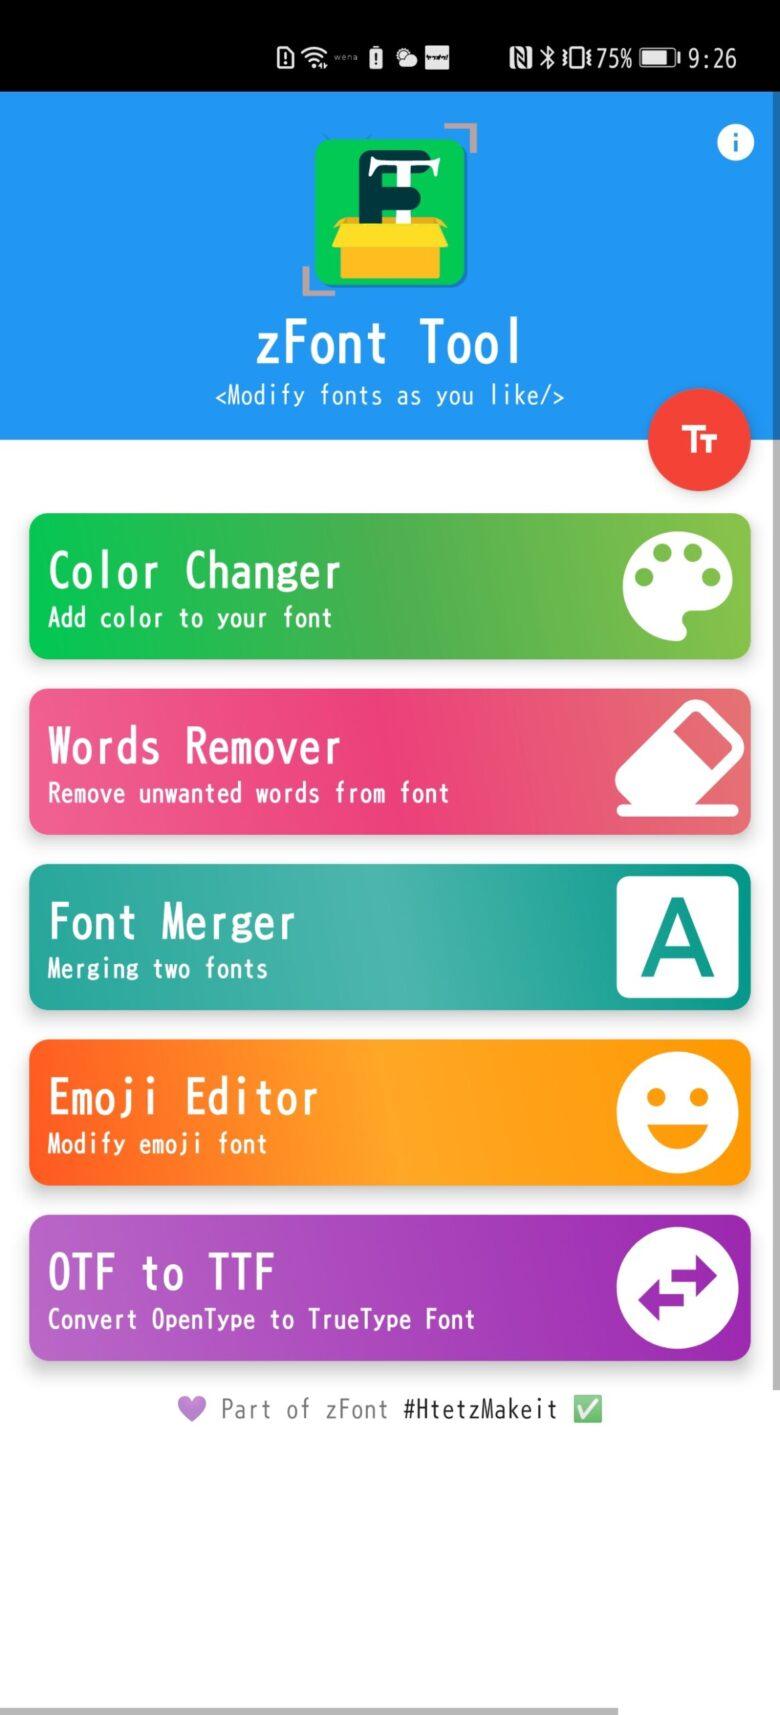 Z Font Toolアプリのホーム画面。